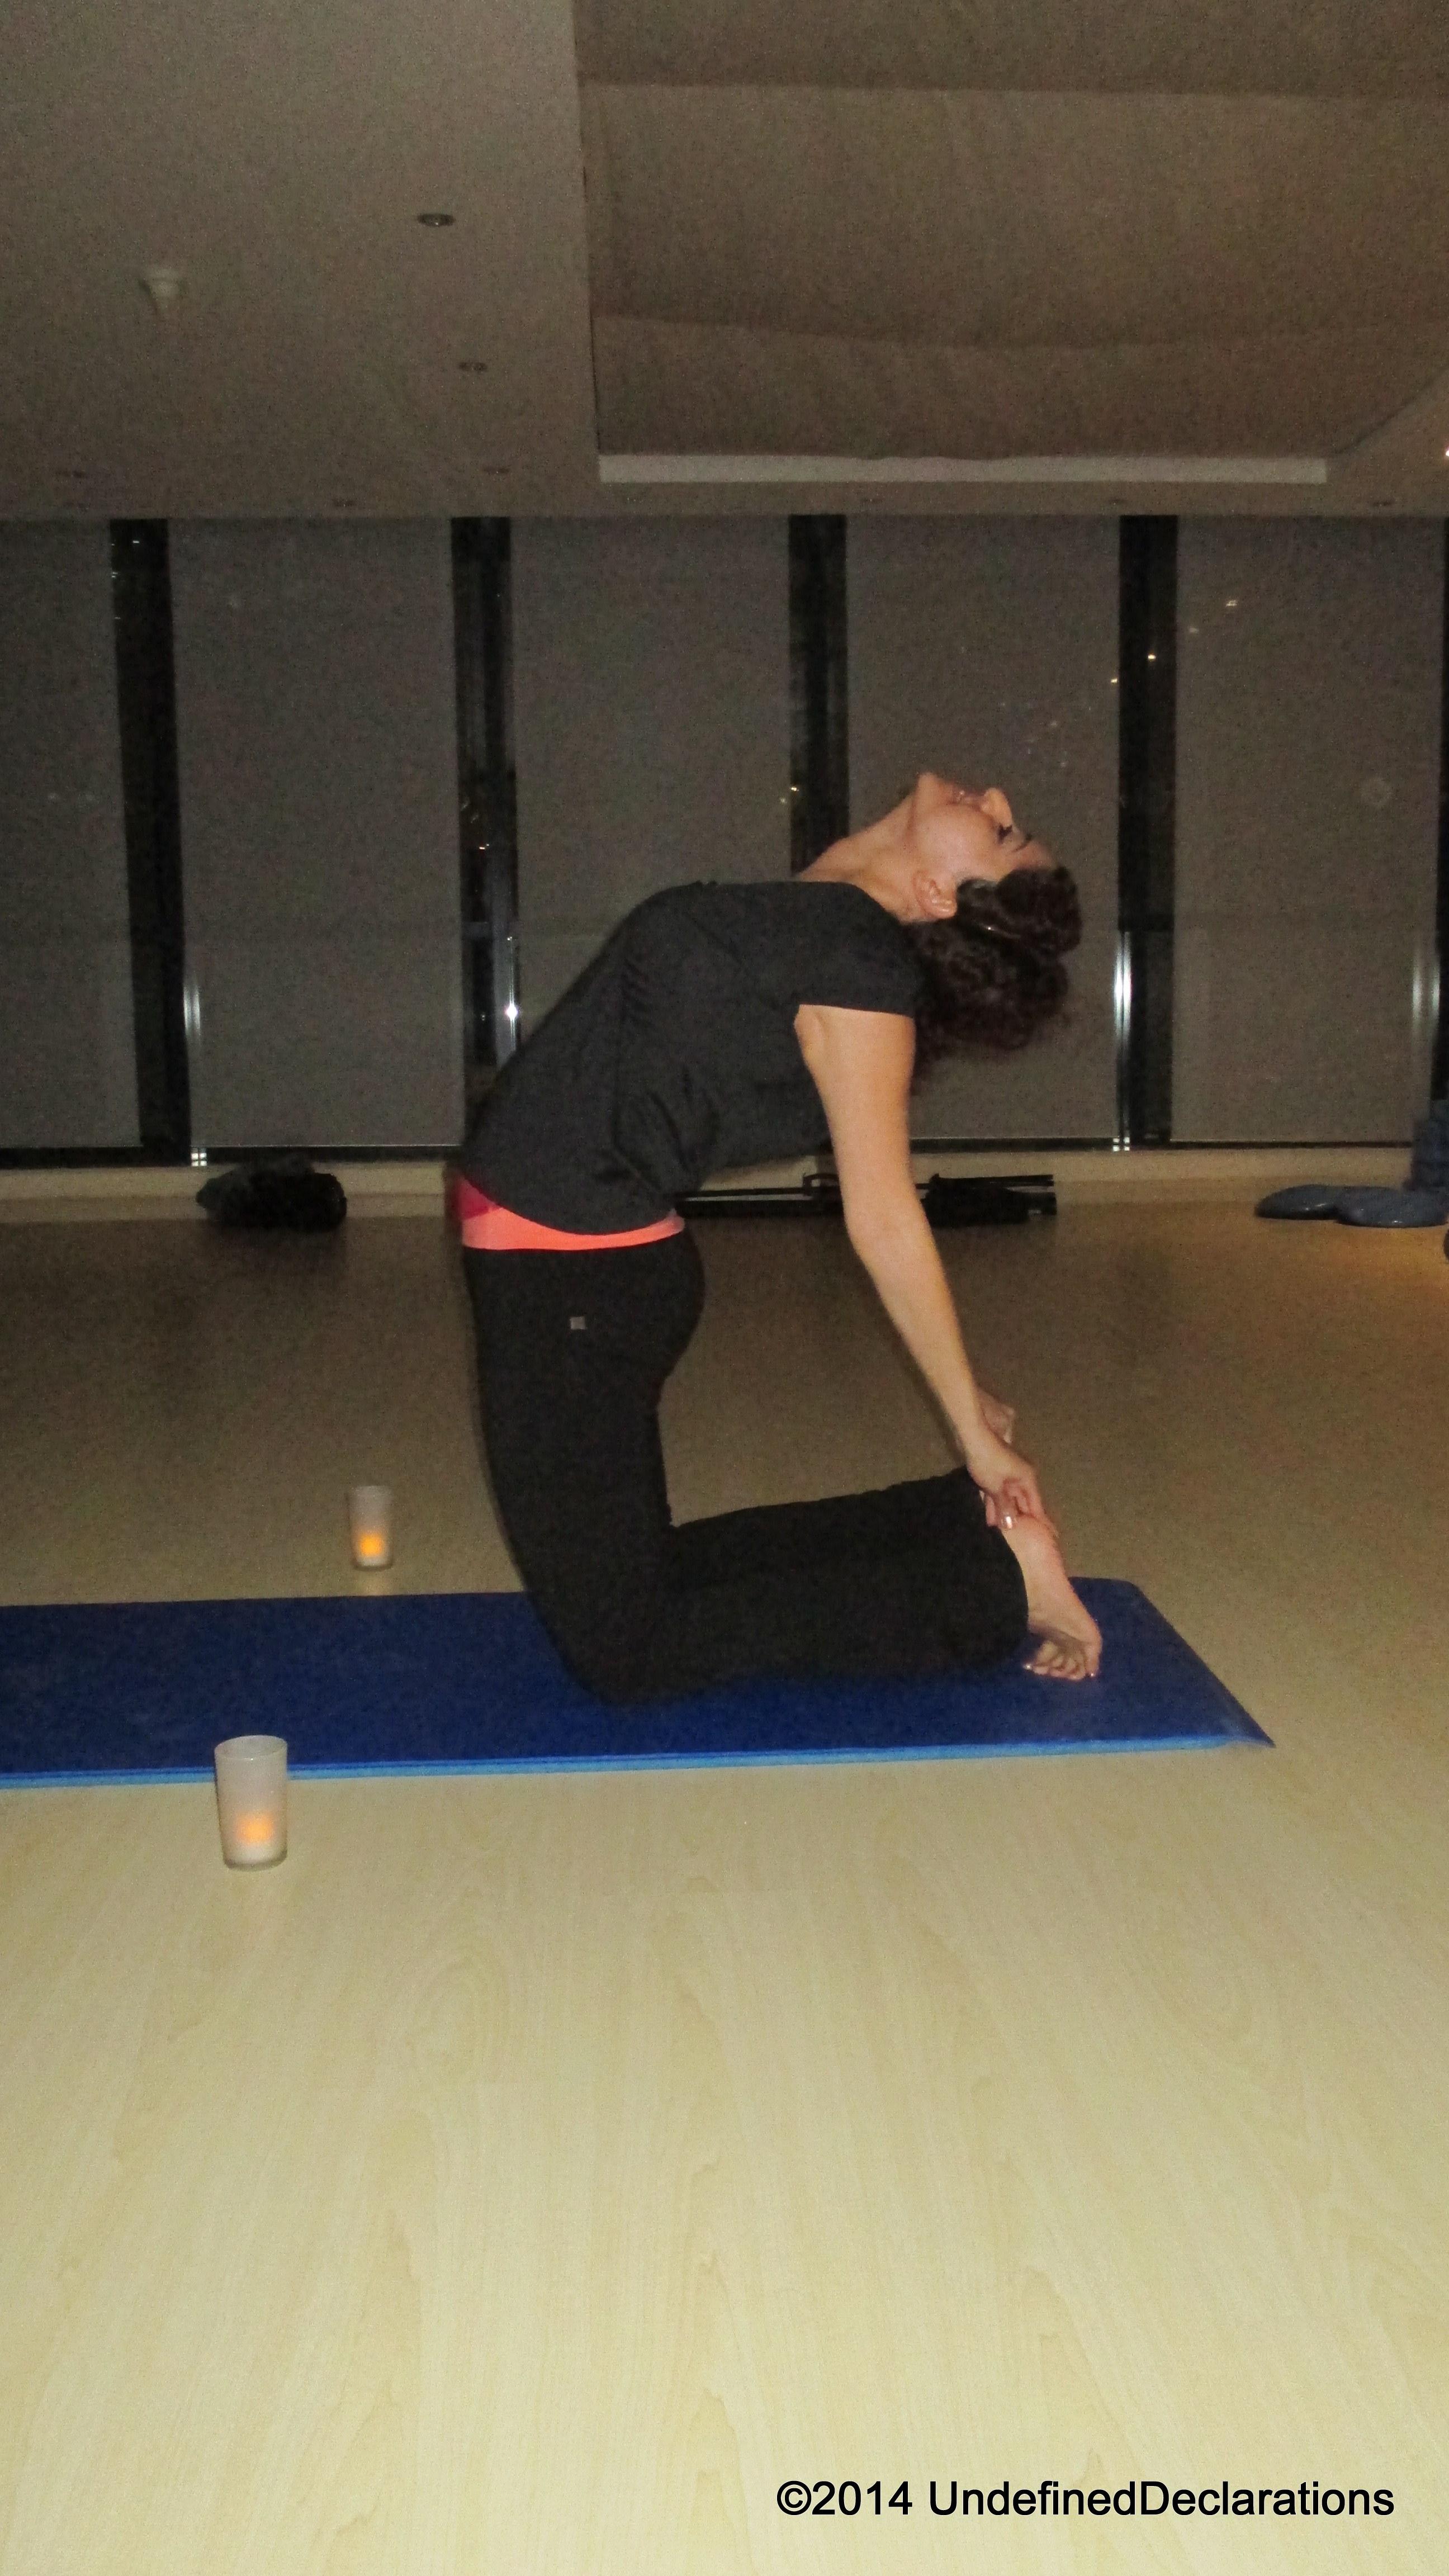 UD Review: Yoga Ashram